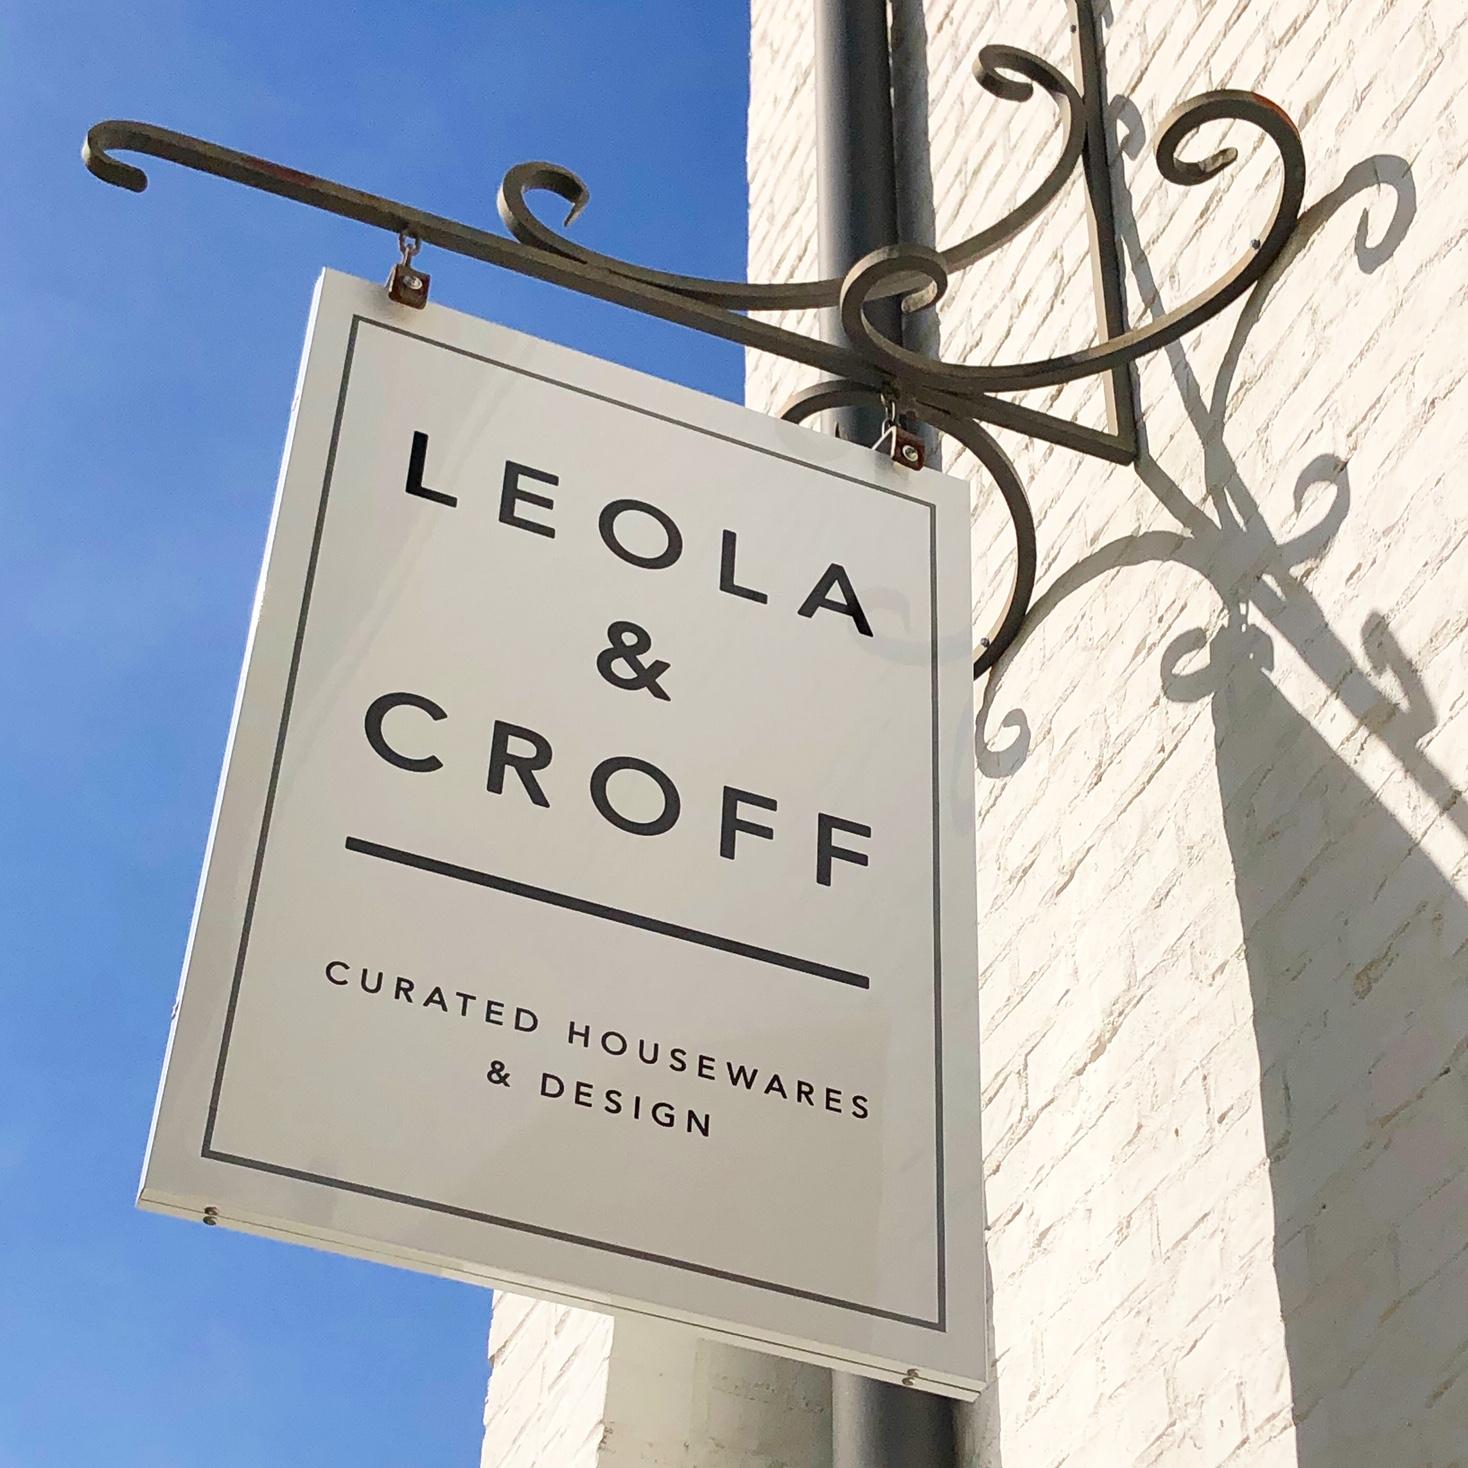 Leola&Croff Sign.JPG